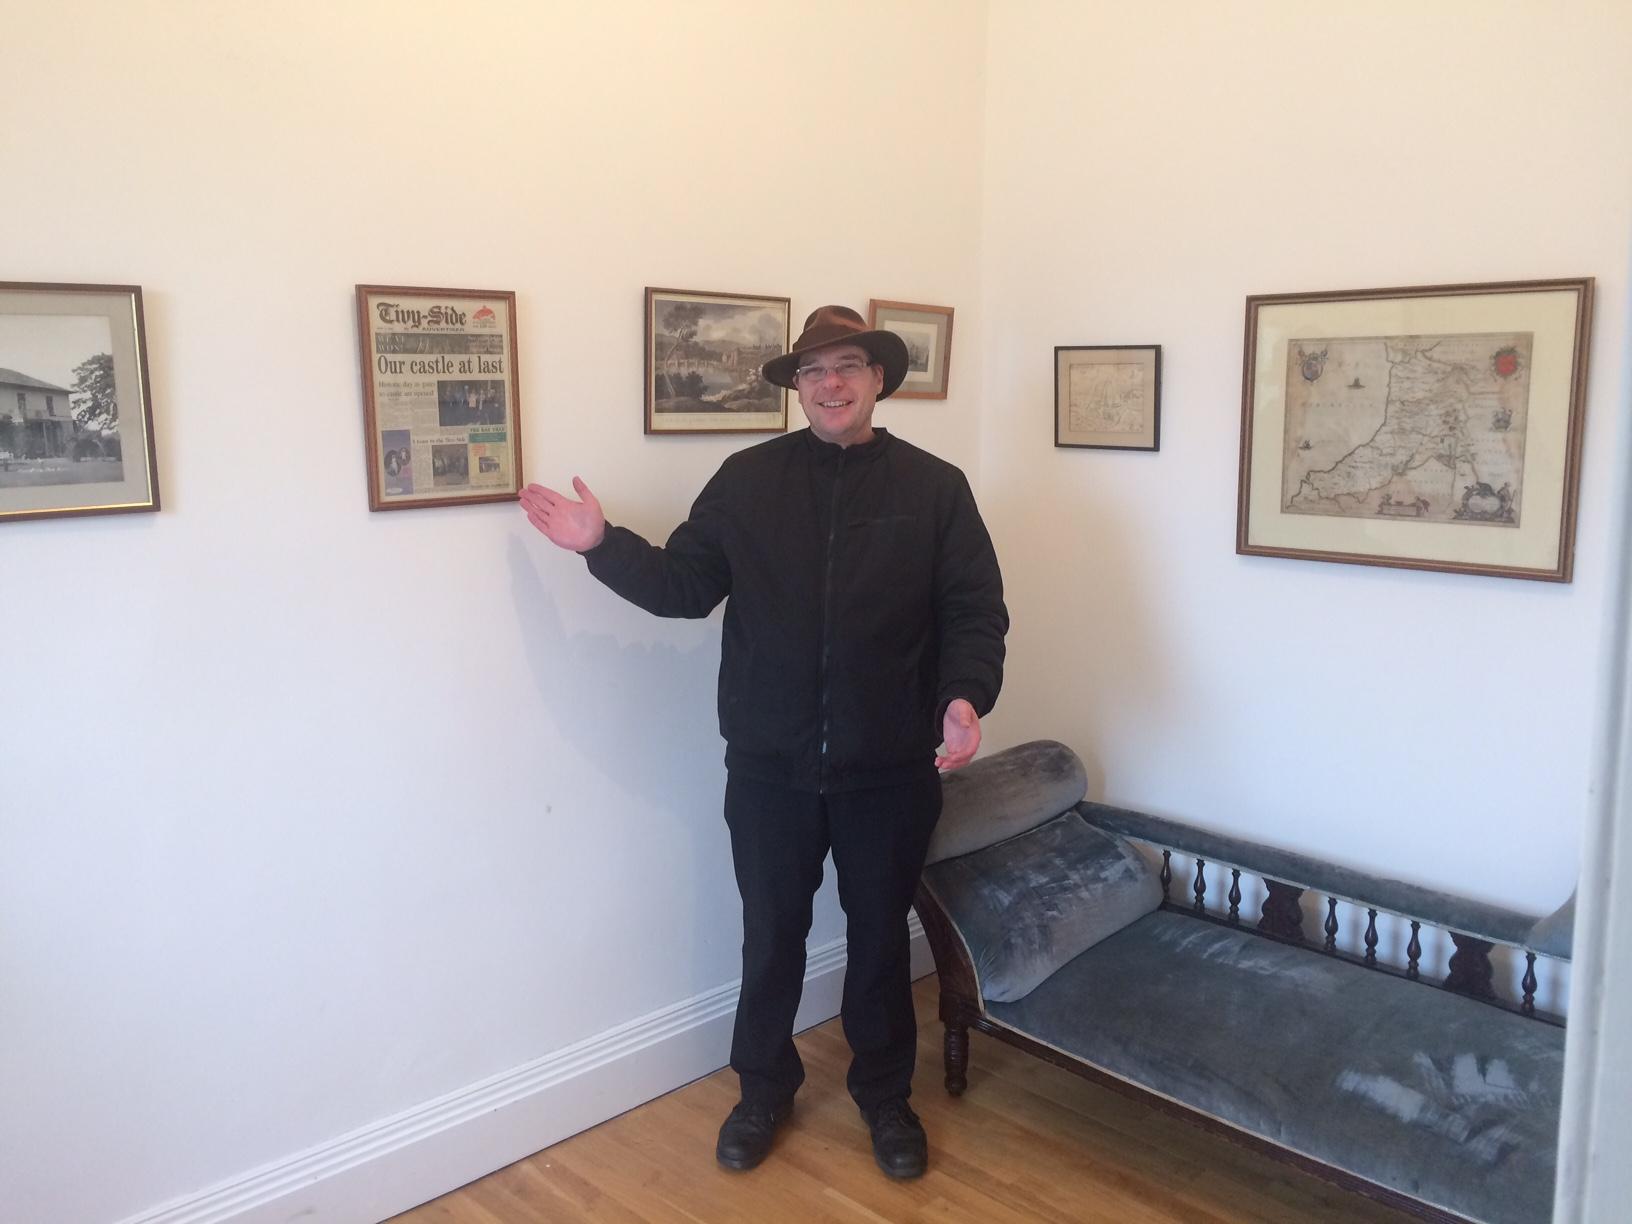 Glen, our tour guide at Cardigan Castle.